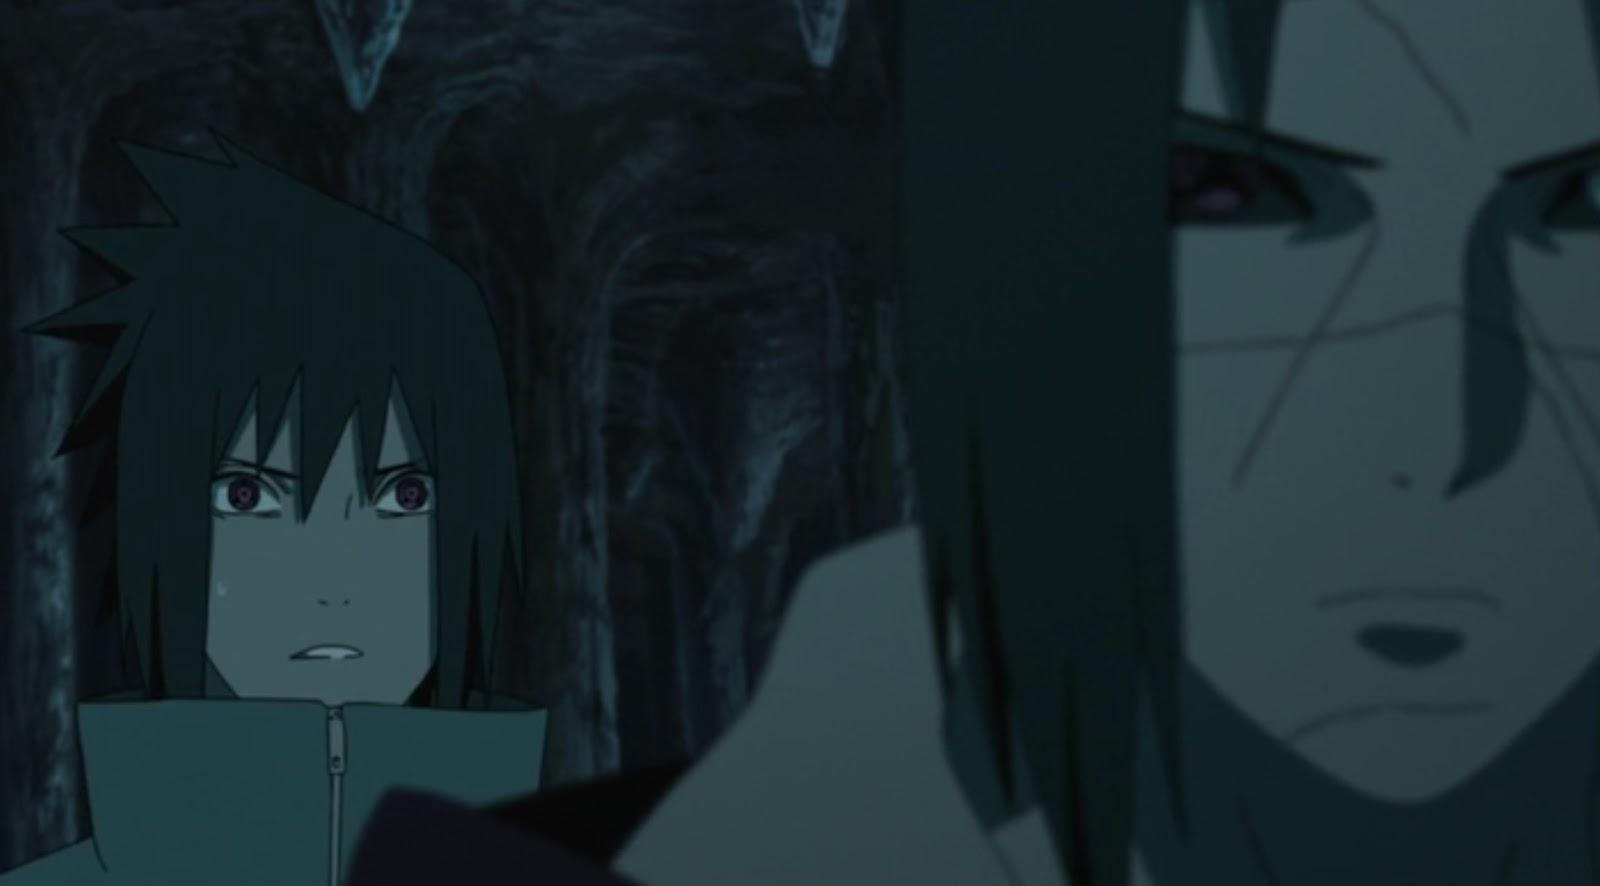 Naruto Shippuden: Episódio 338 – Izanagi e Izanami